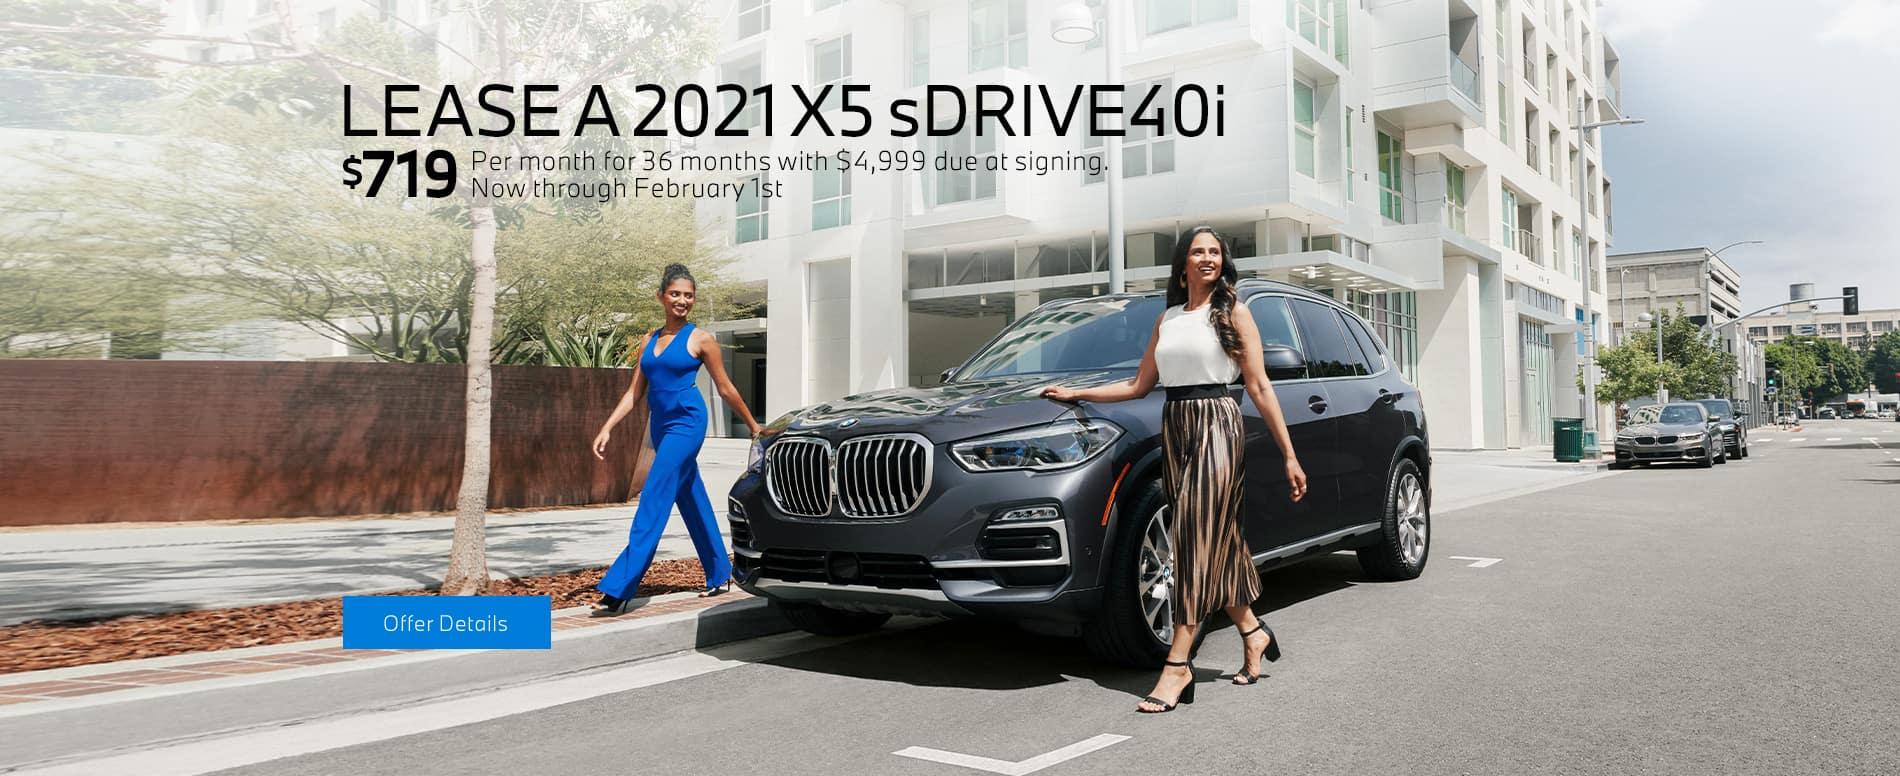 LEASE A 2021 BMW X5 sDRIVE40i